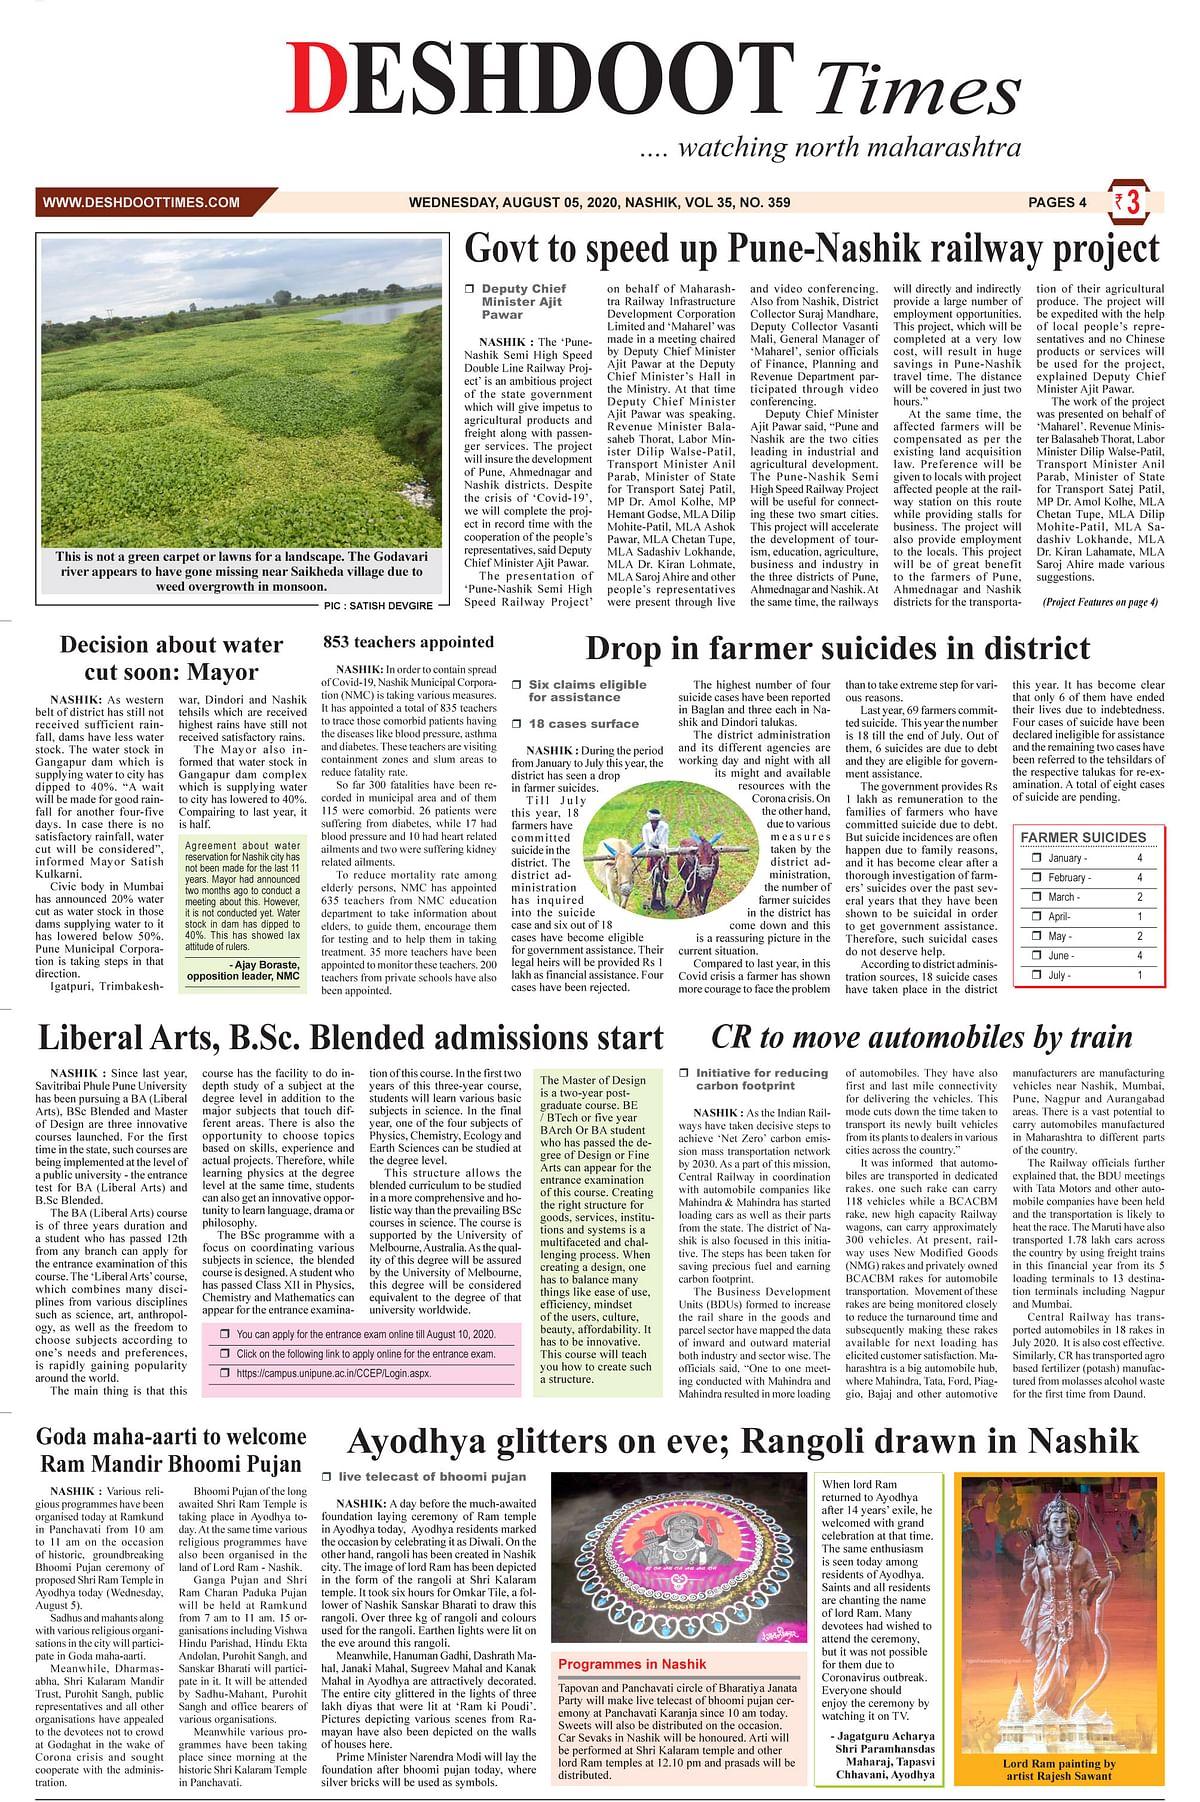 Deshdoot Times E Paper, 5 August 2020